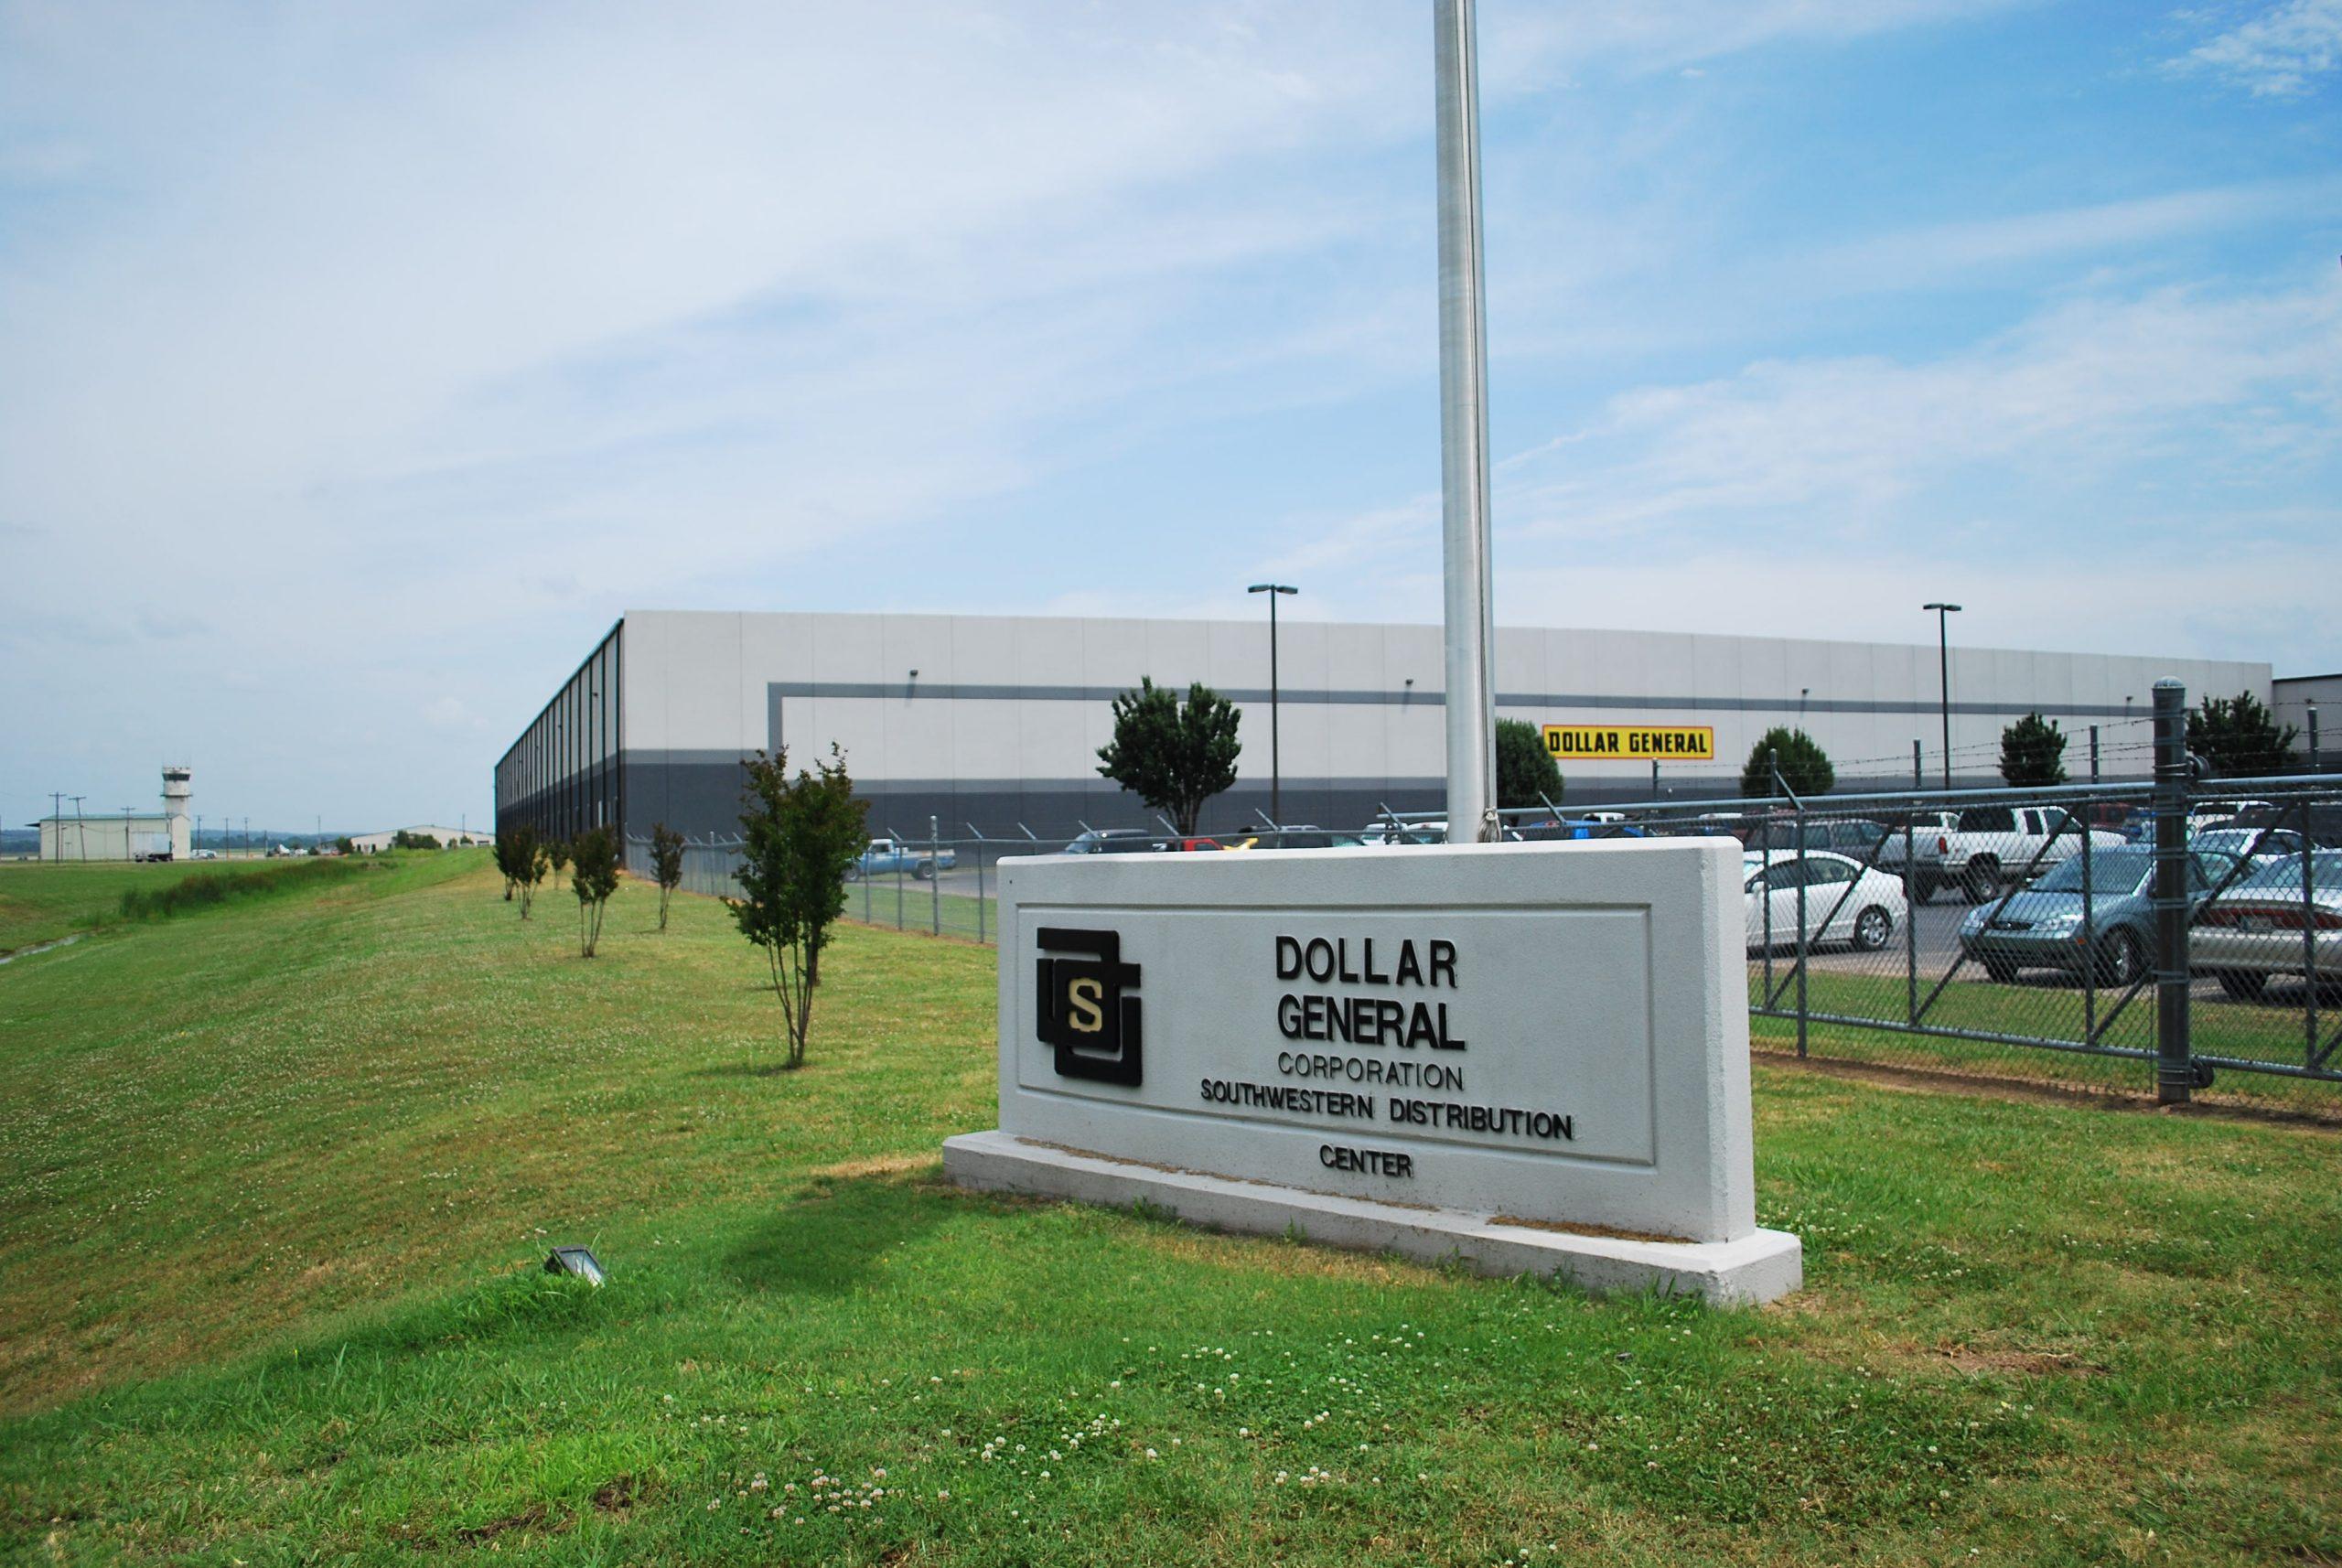 A large Dollar General Distribution Center building